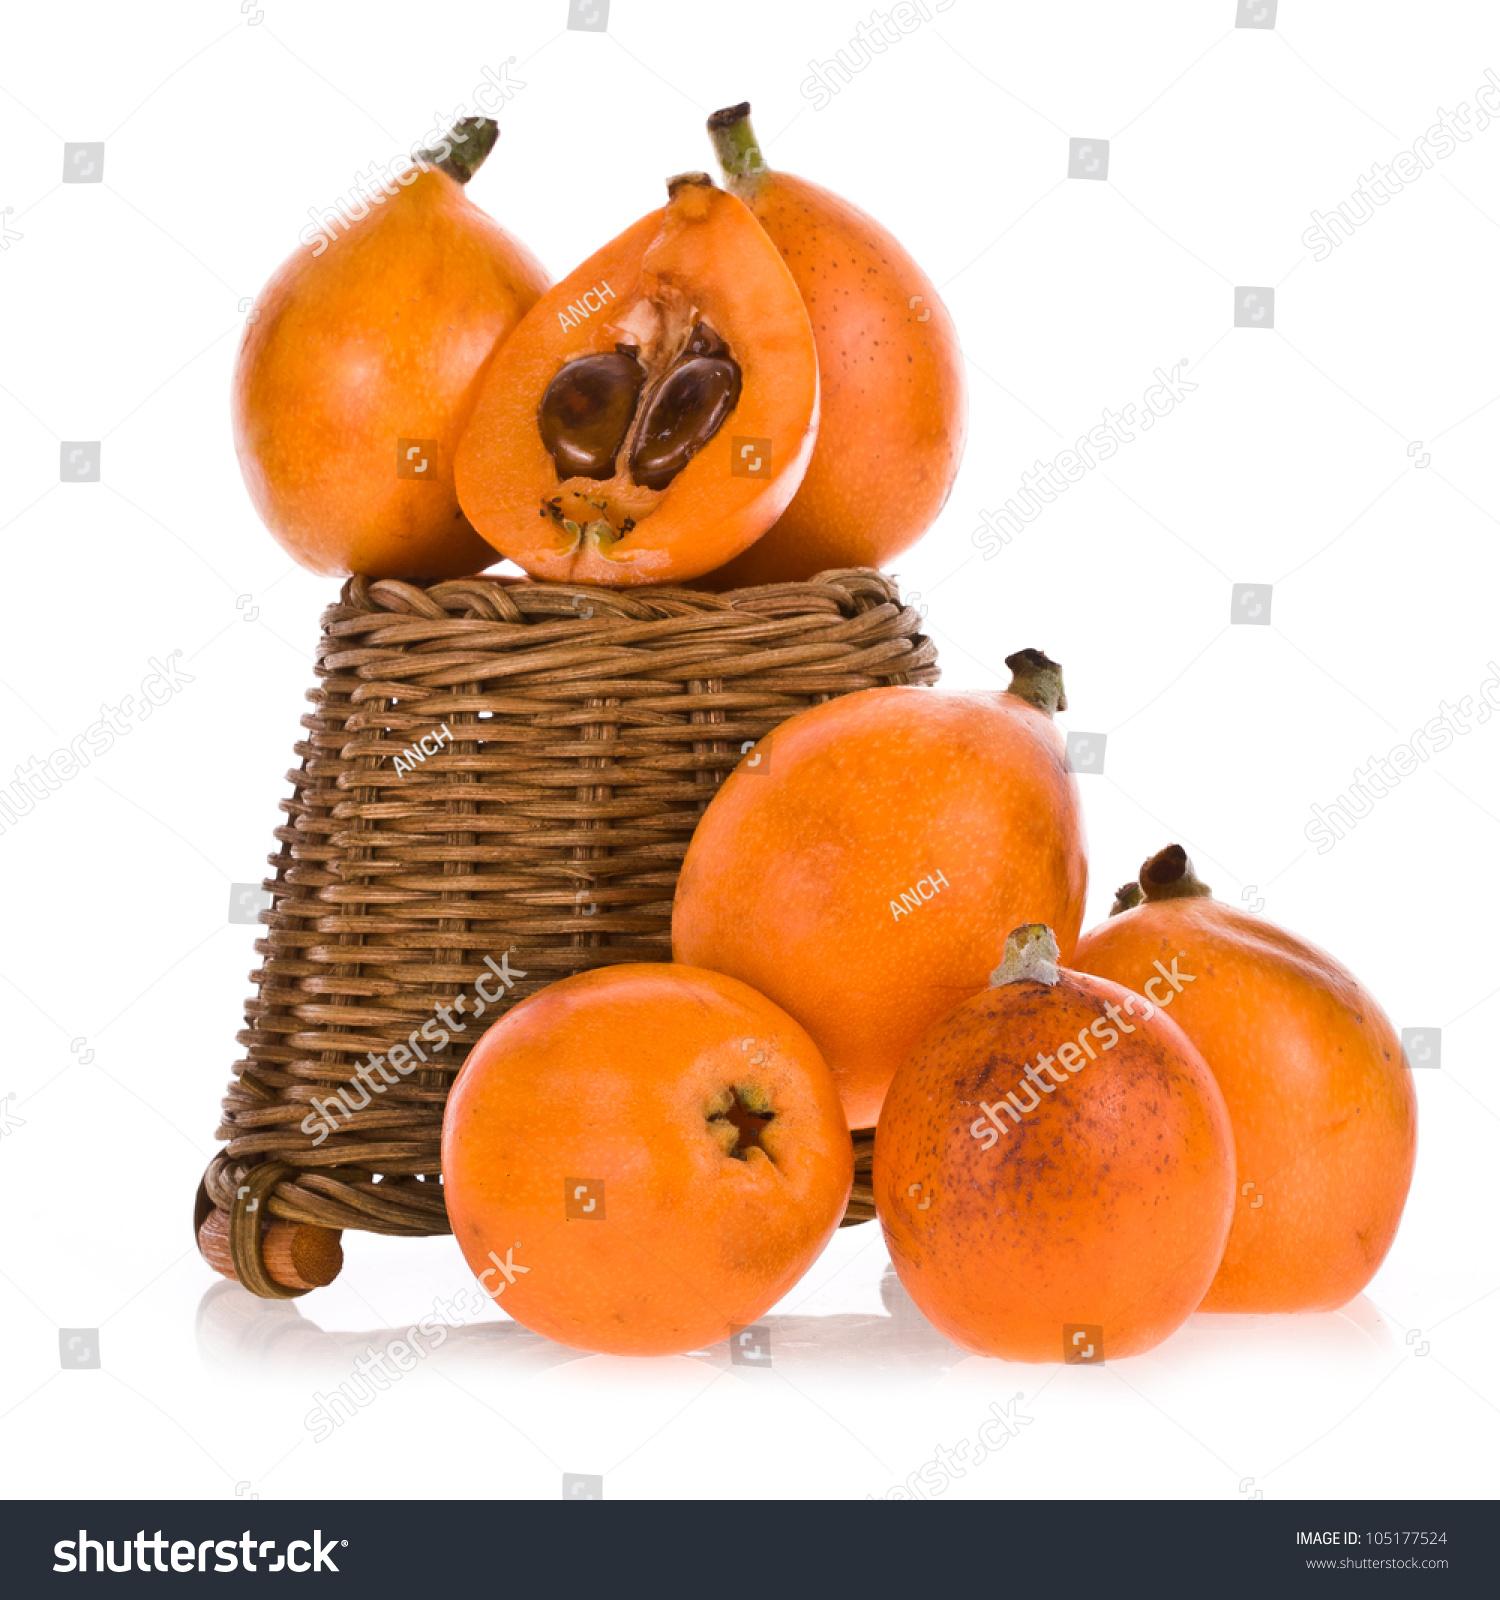 loquat fruit hanging fruit basket